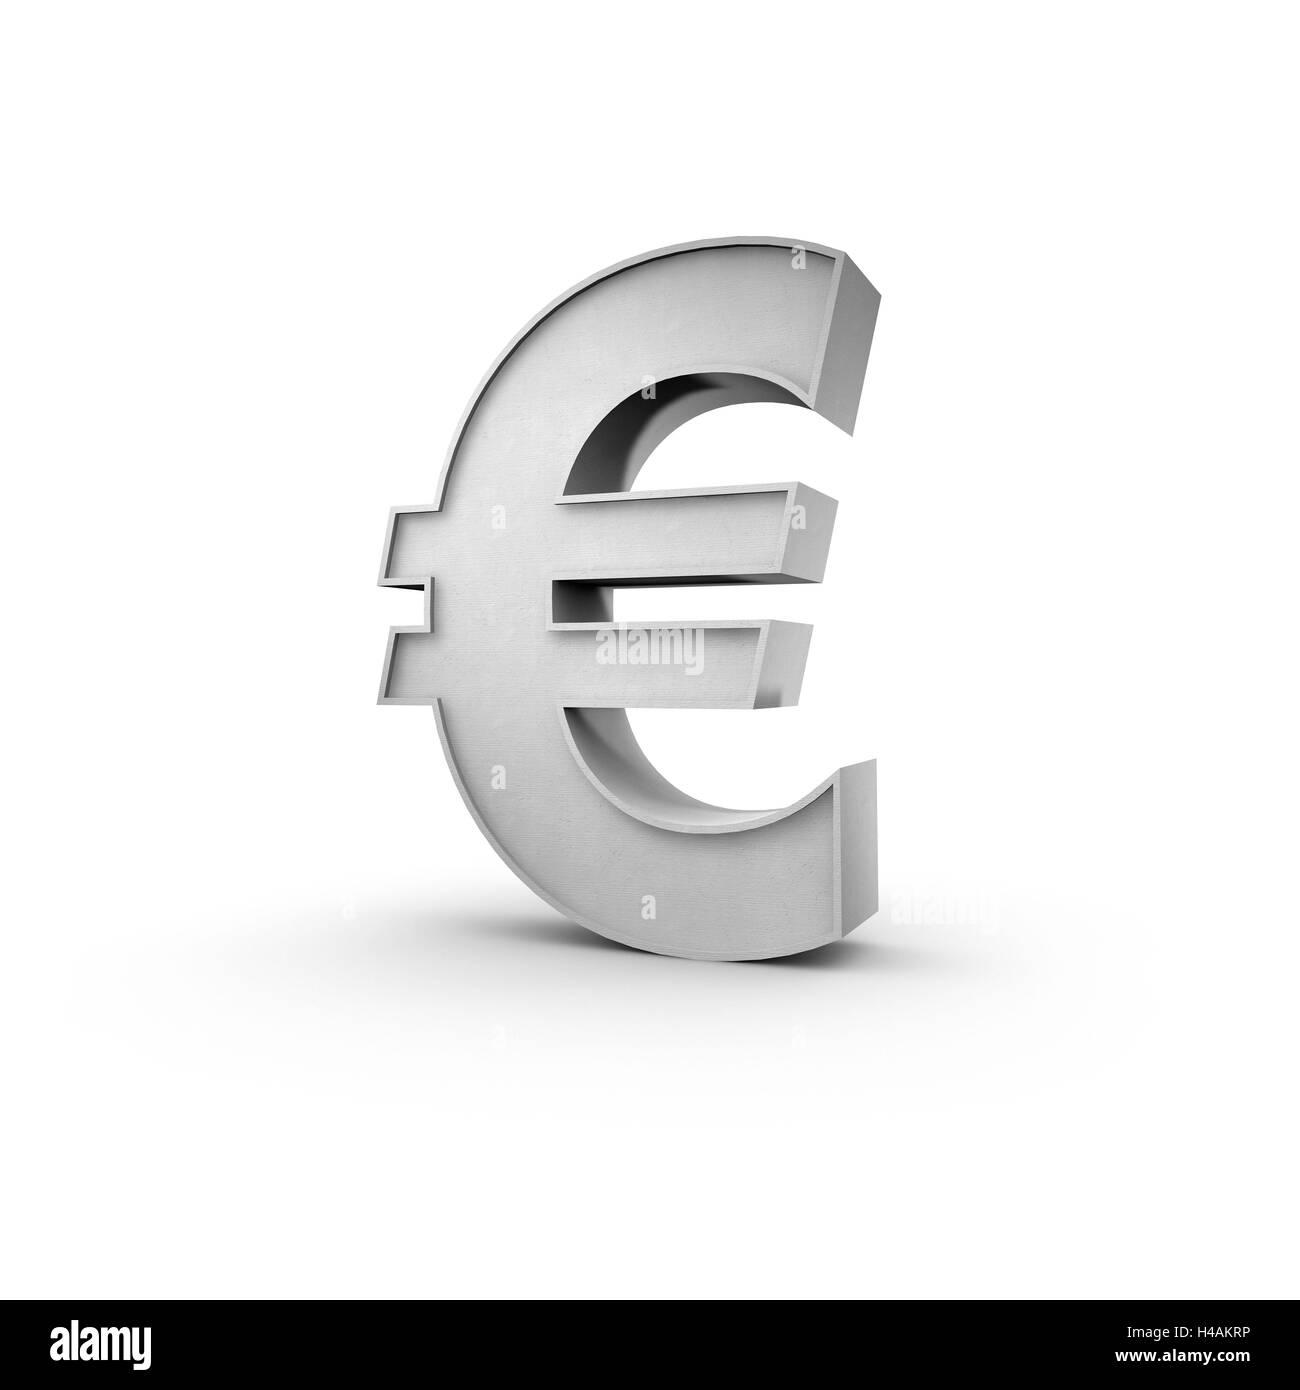 3D eurocharacter €, background white, - Stock Image